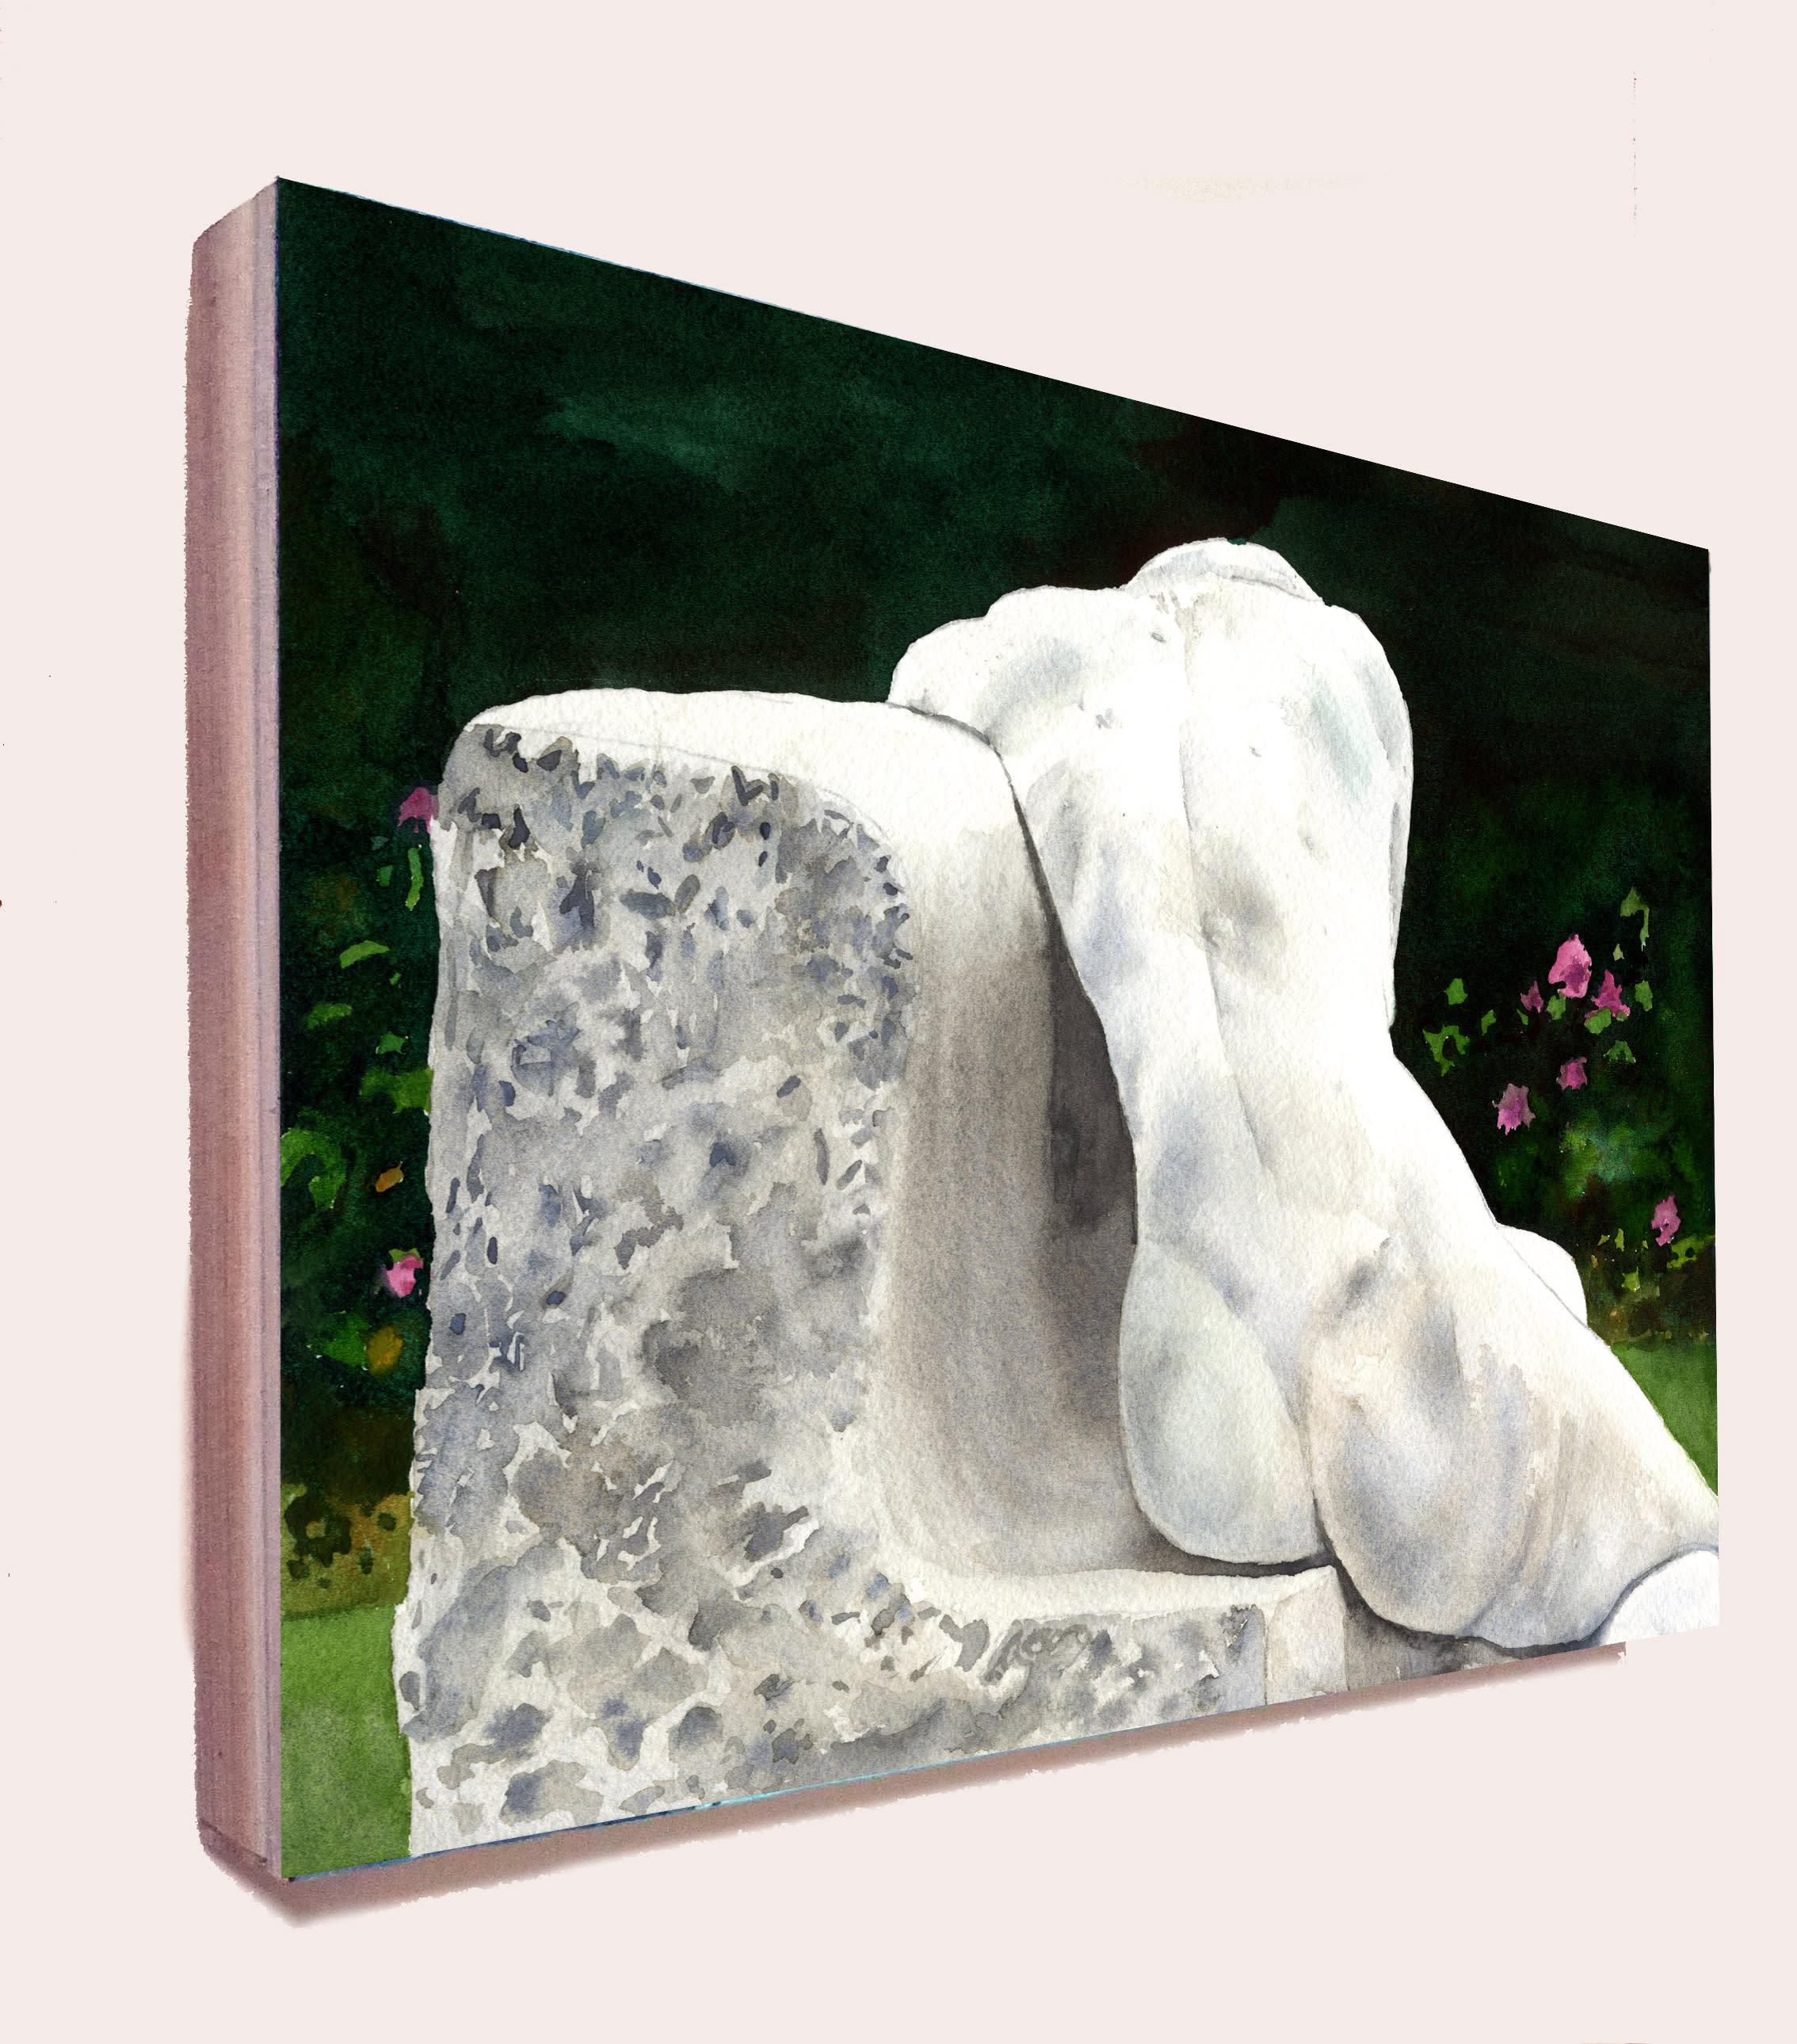 Sculpture of a woman 1 bok0nm